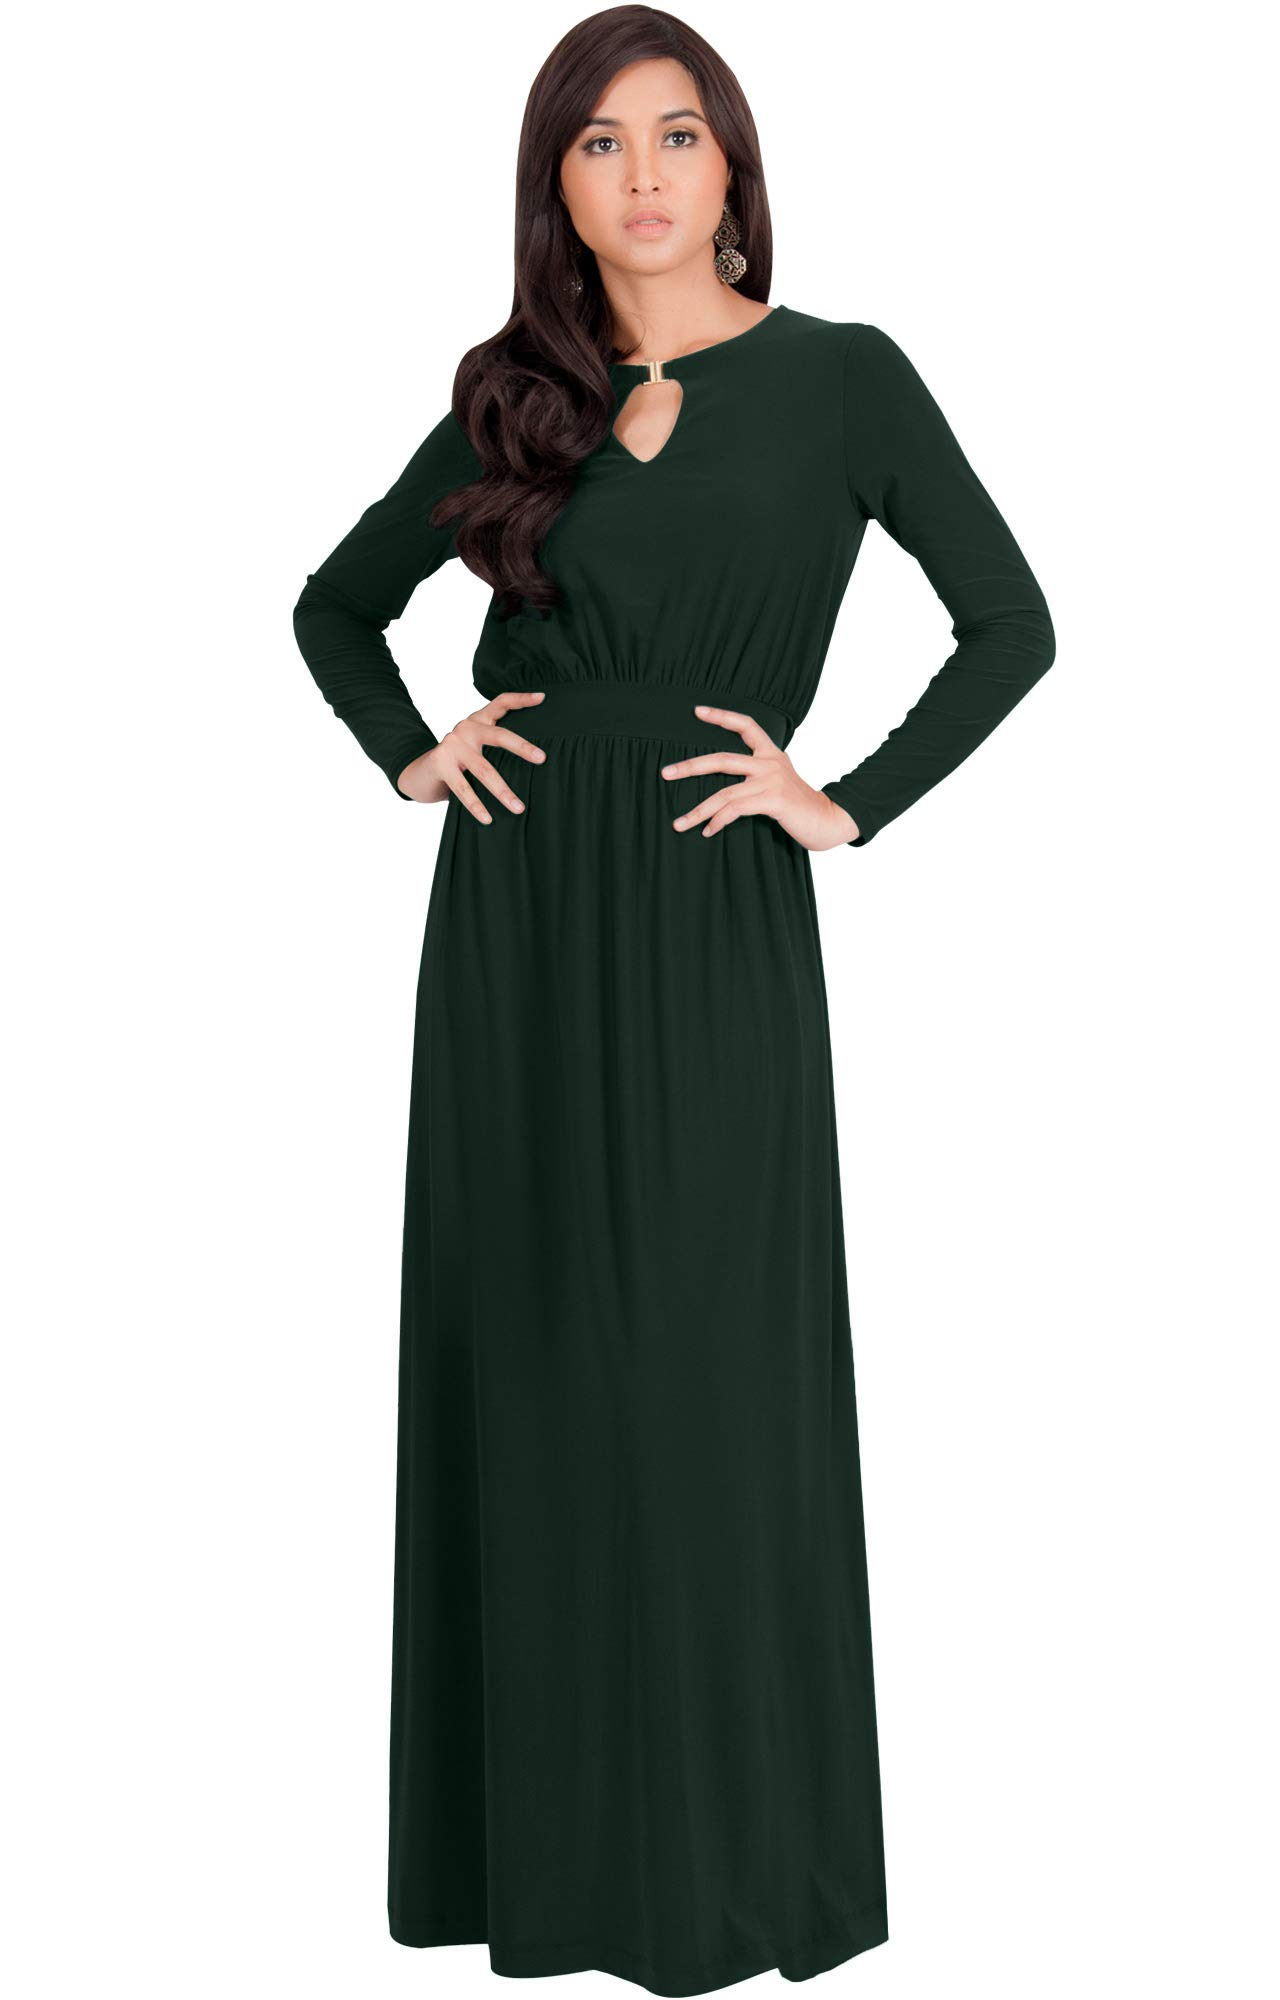 951dd3f6db Work Plus Size Empire Waist Dresses